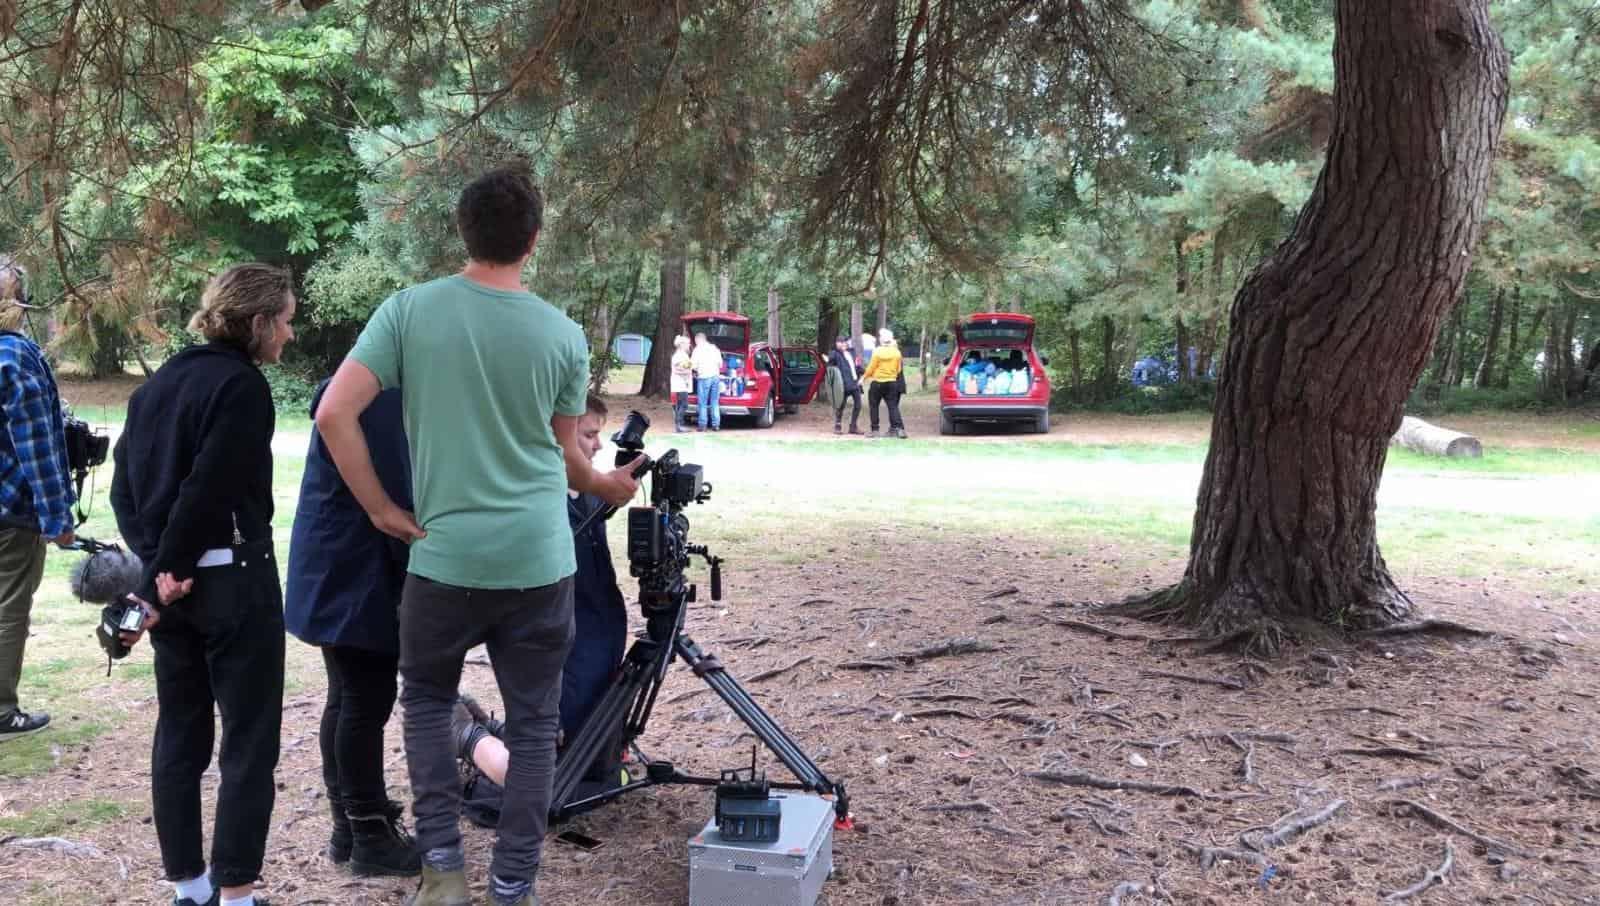 Filming at Burnbake